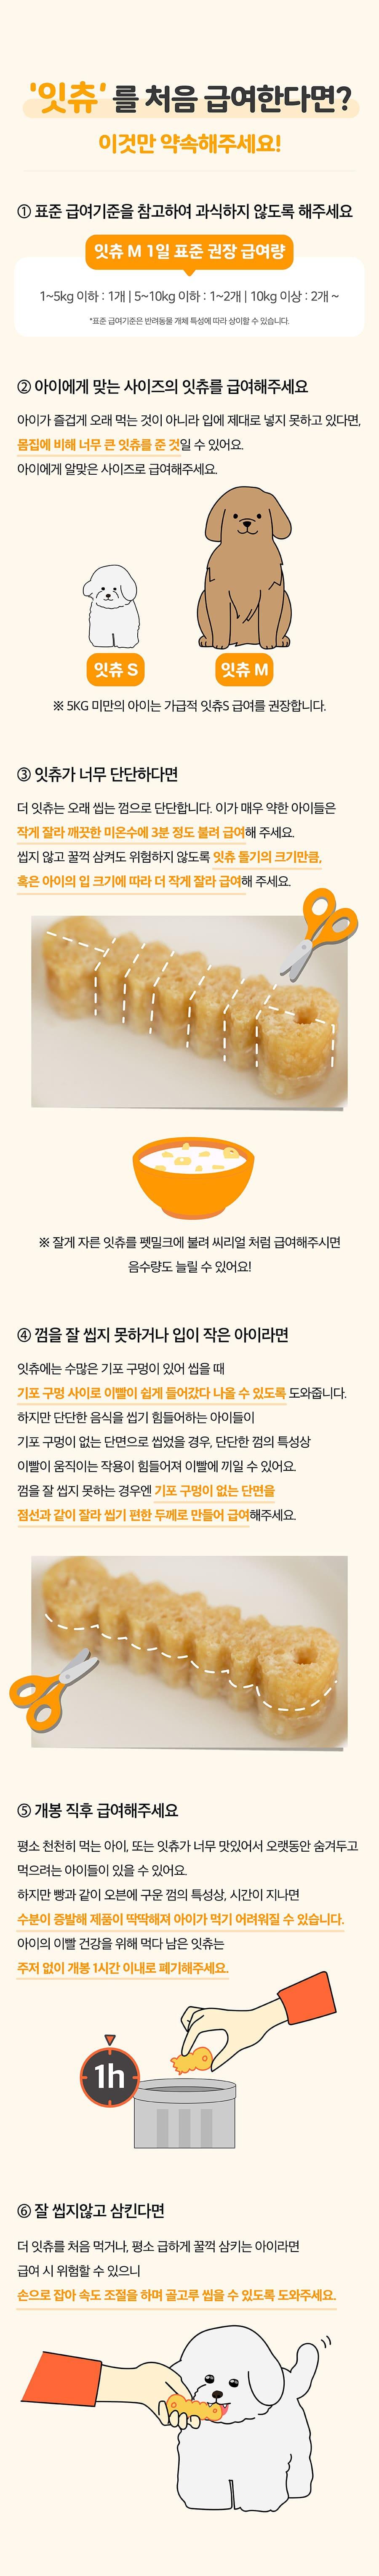 [EVENT] it 더 잇츄 옐로우 M (8개입)-상품이미지-20